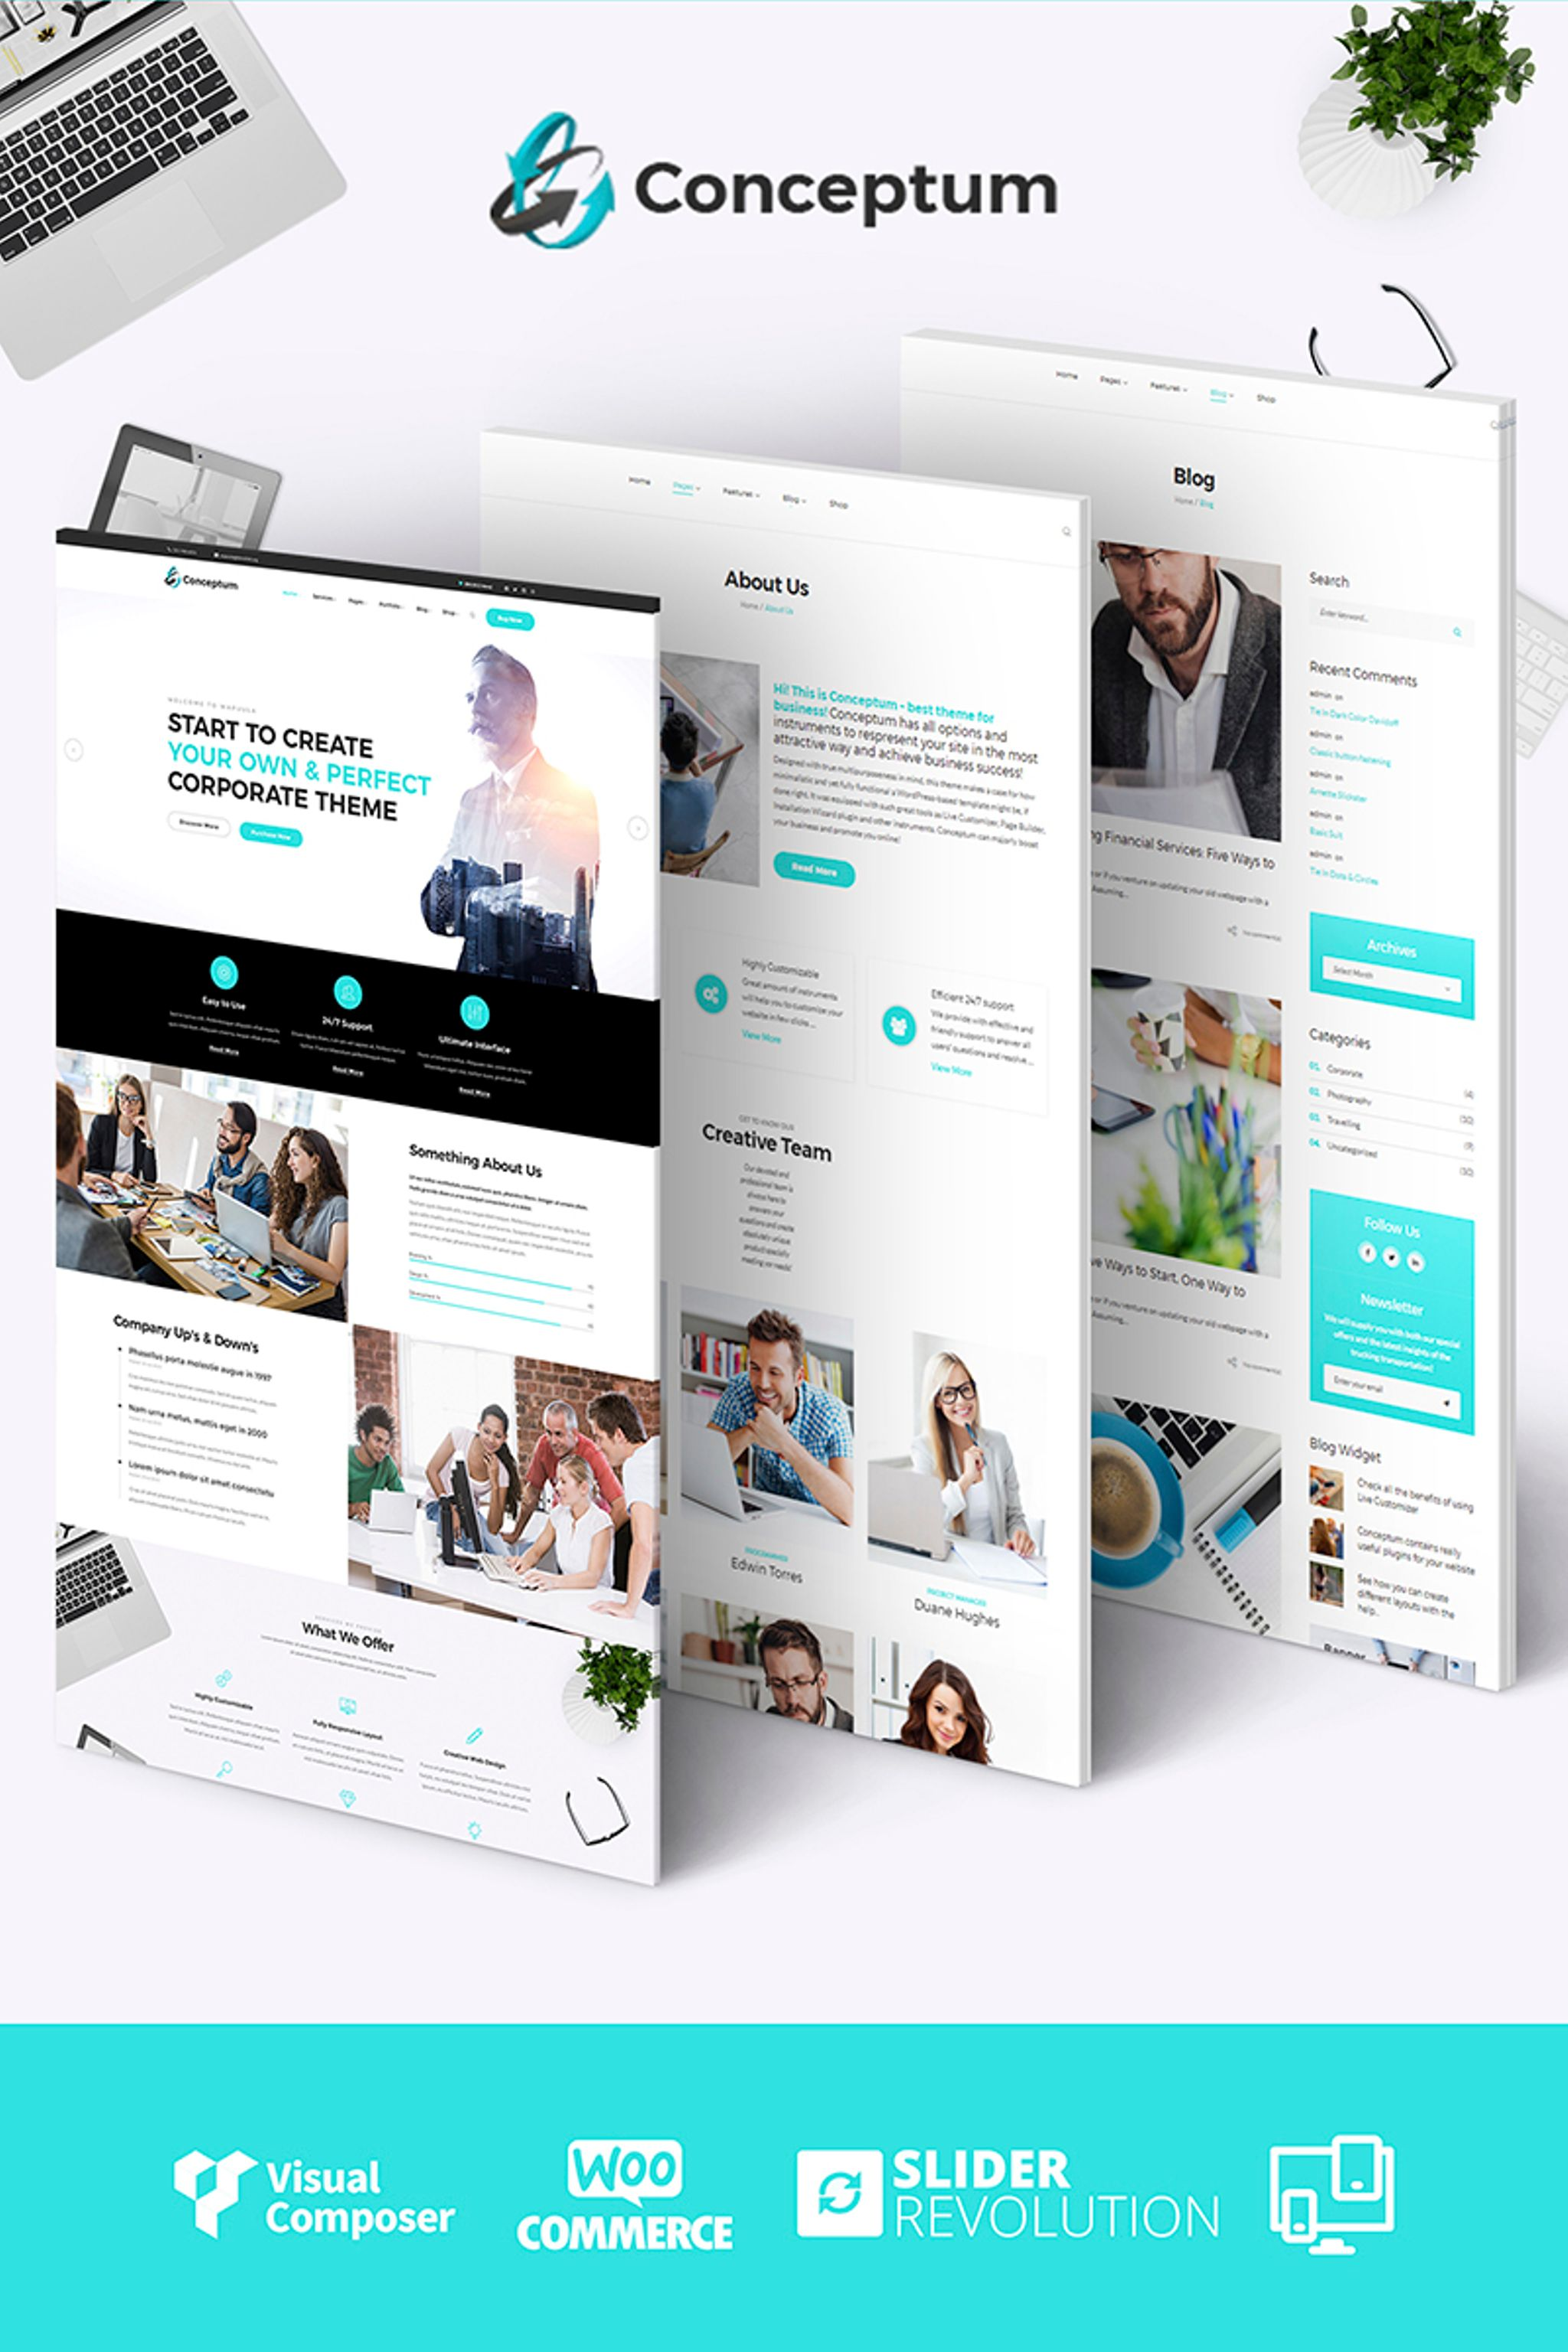 Motyw WordPress Conceptum - Corporate Responsive #65934 - zrzut ekranu